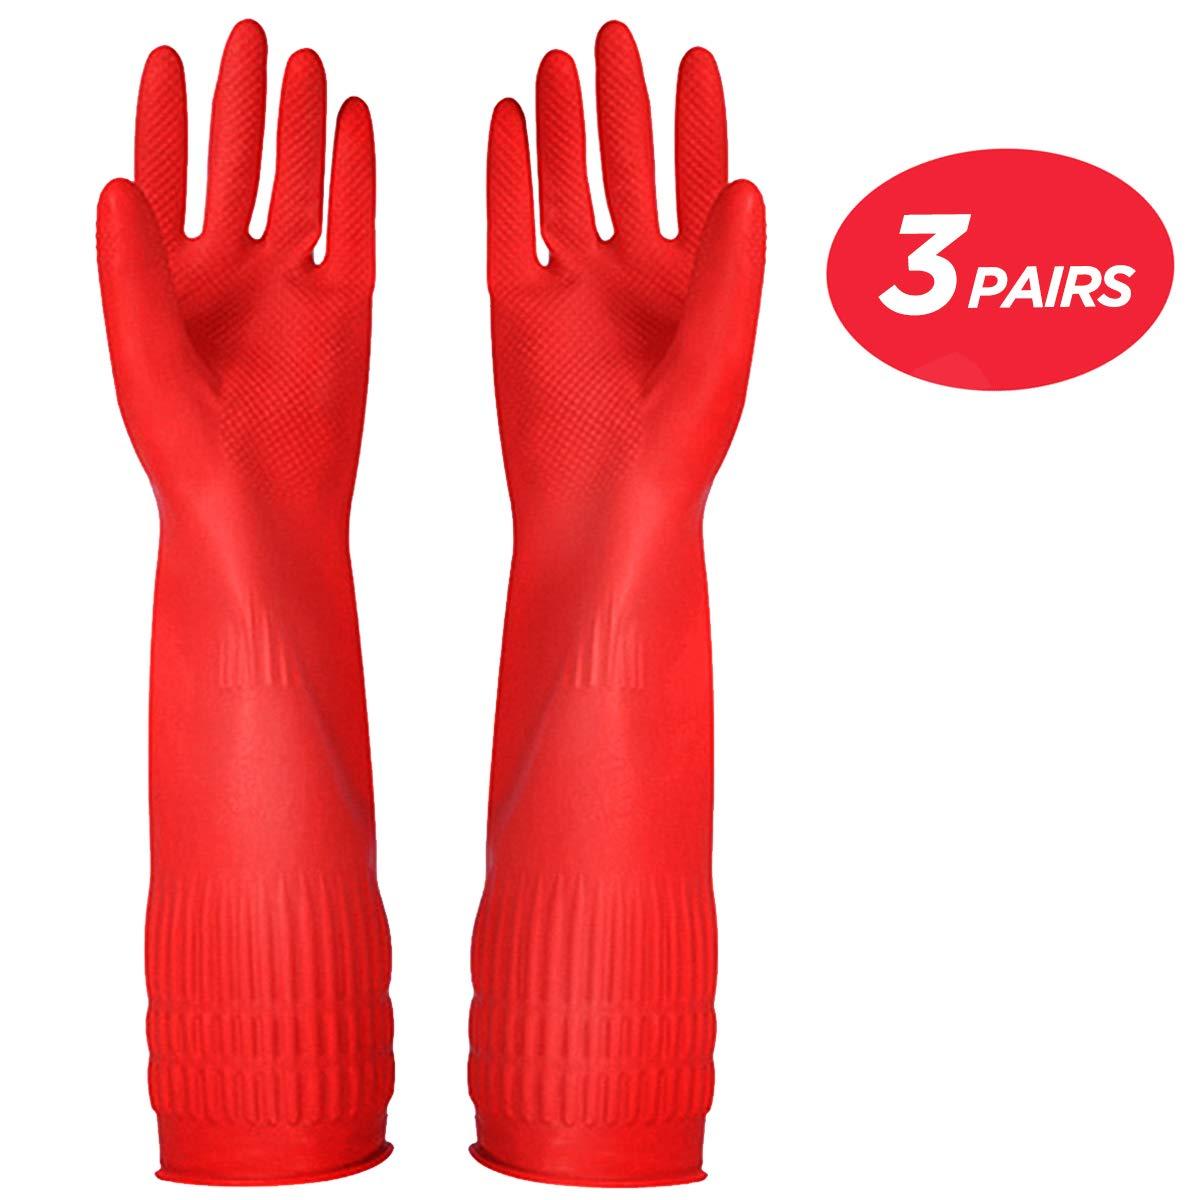 Rubber Cleaning Gloves Kitchen Dishwashing Glove 3-Pairs,Waterproof Reuseable.(Medium)